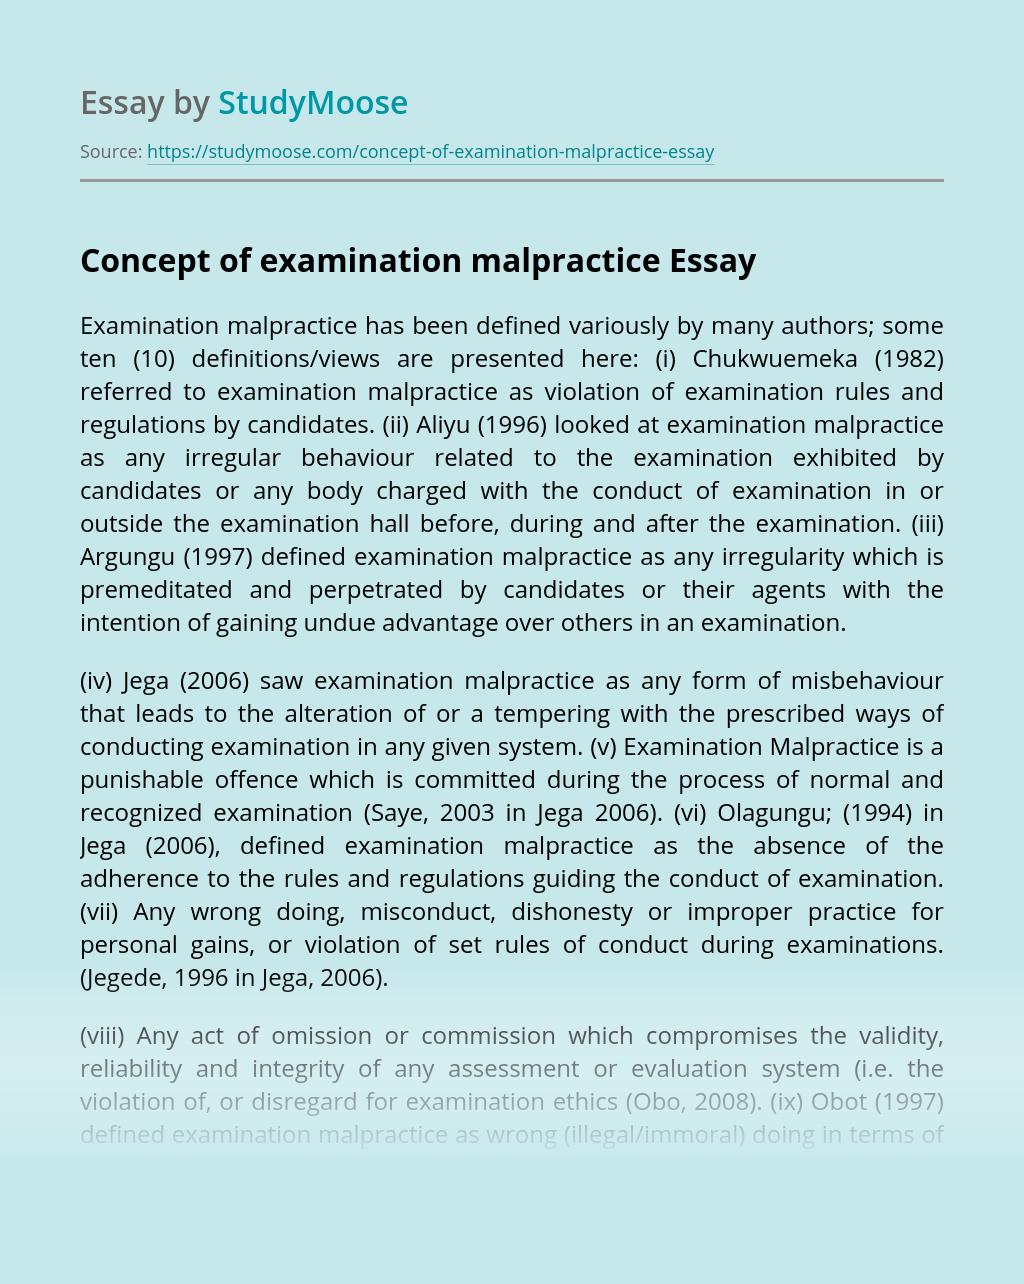 Concept of examination malpractice